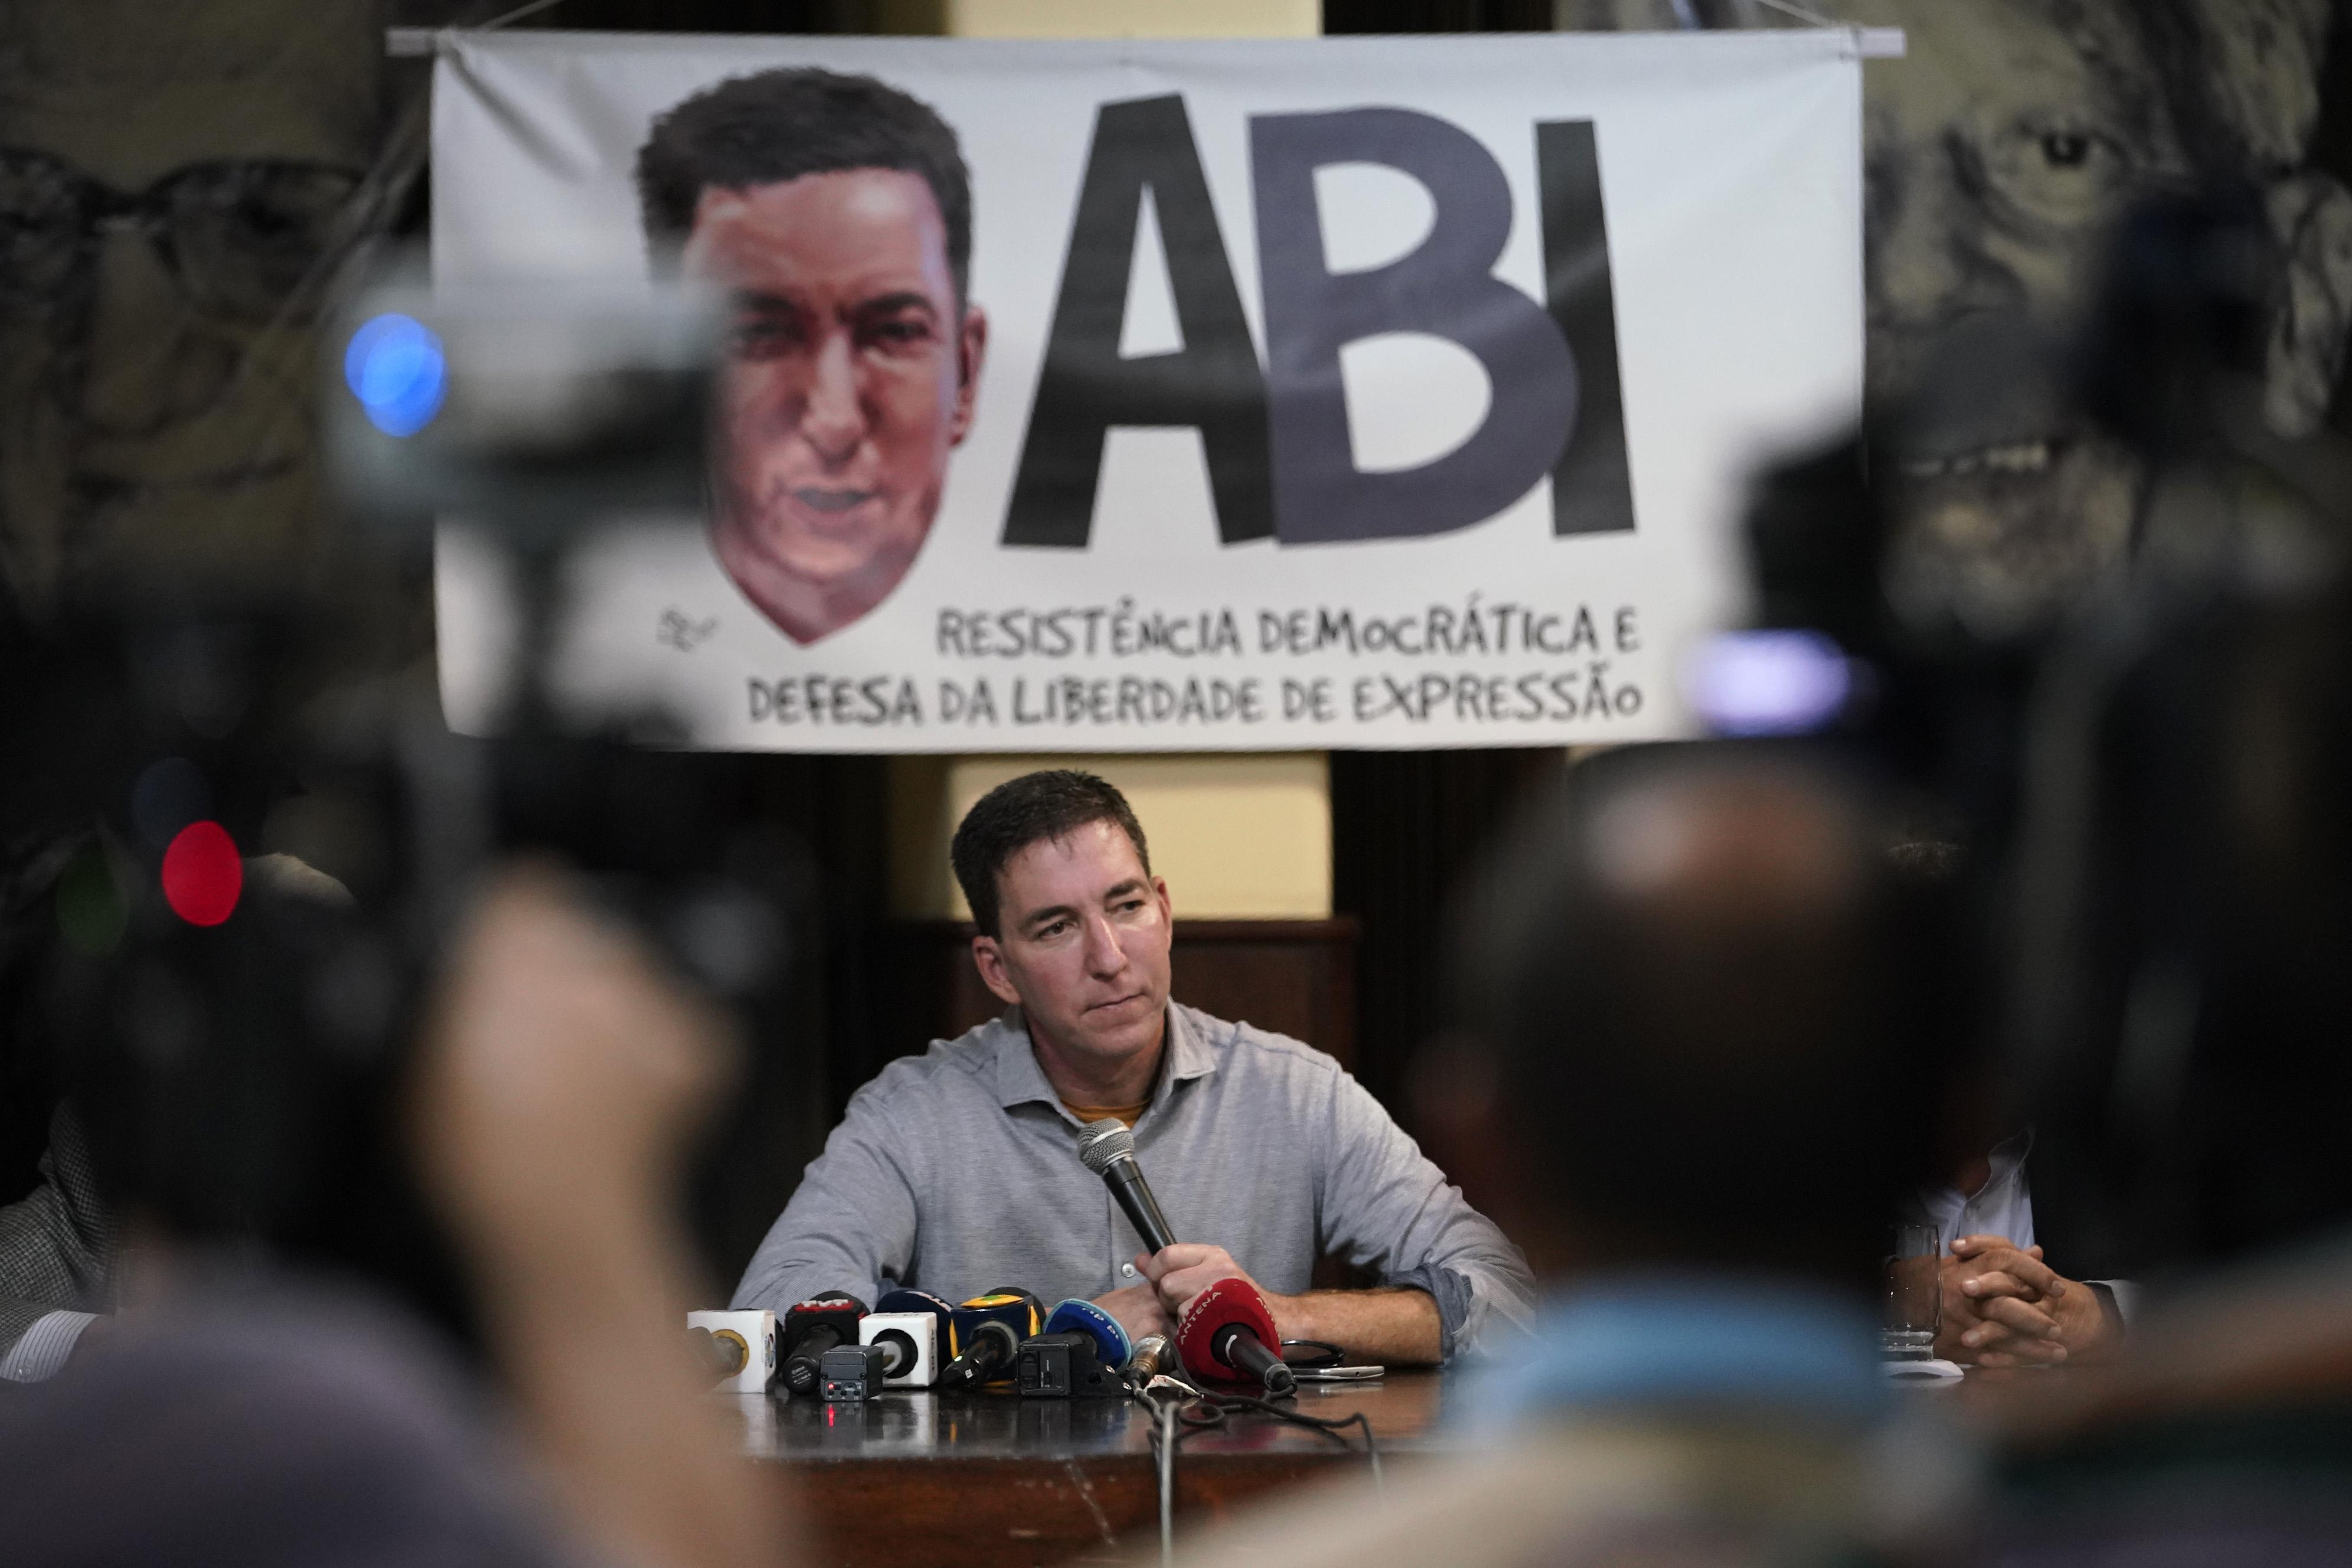 Brazilians rally around U.S. journalist Glenn Greenwald after president's jail threat